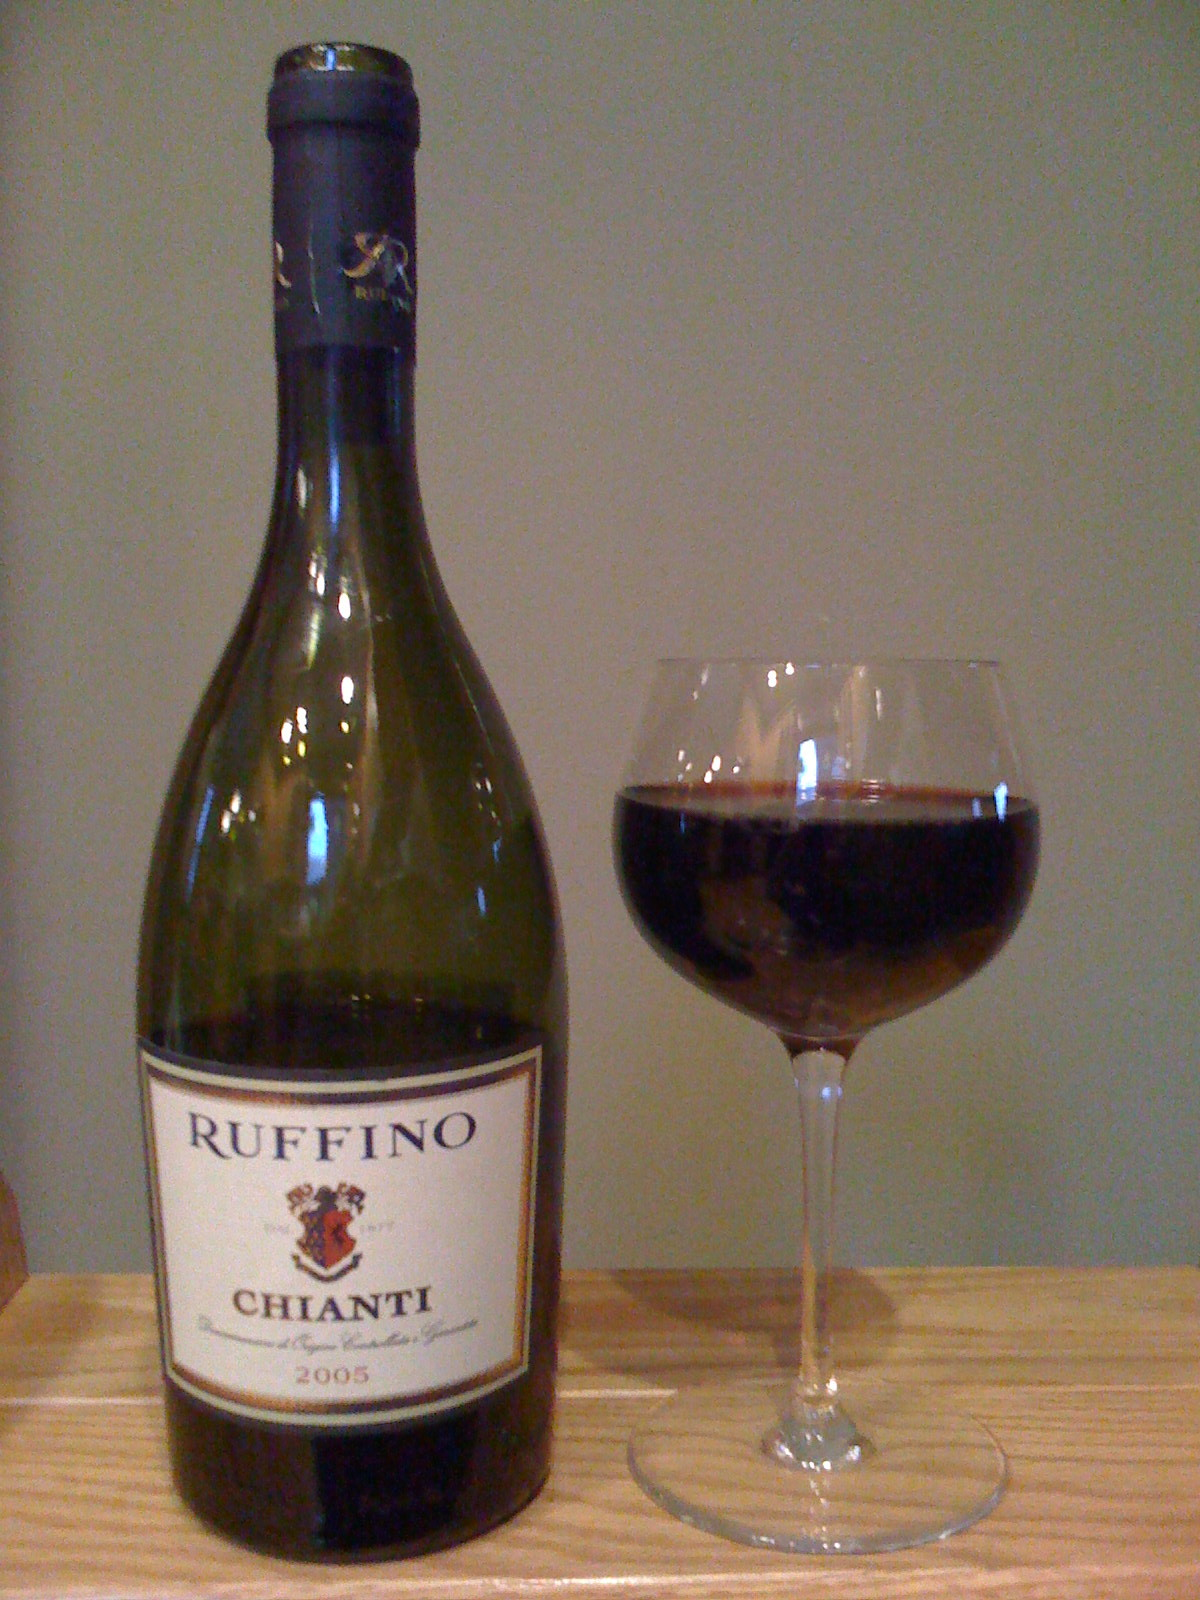 Ruffino Chianti (2005)